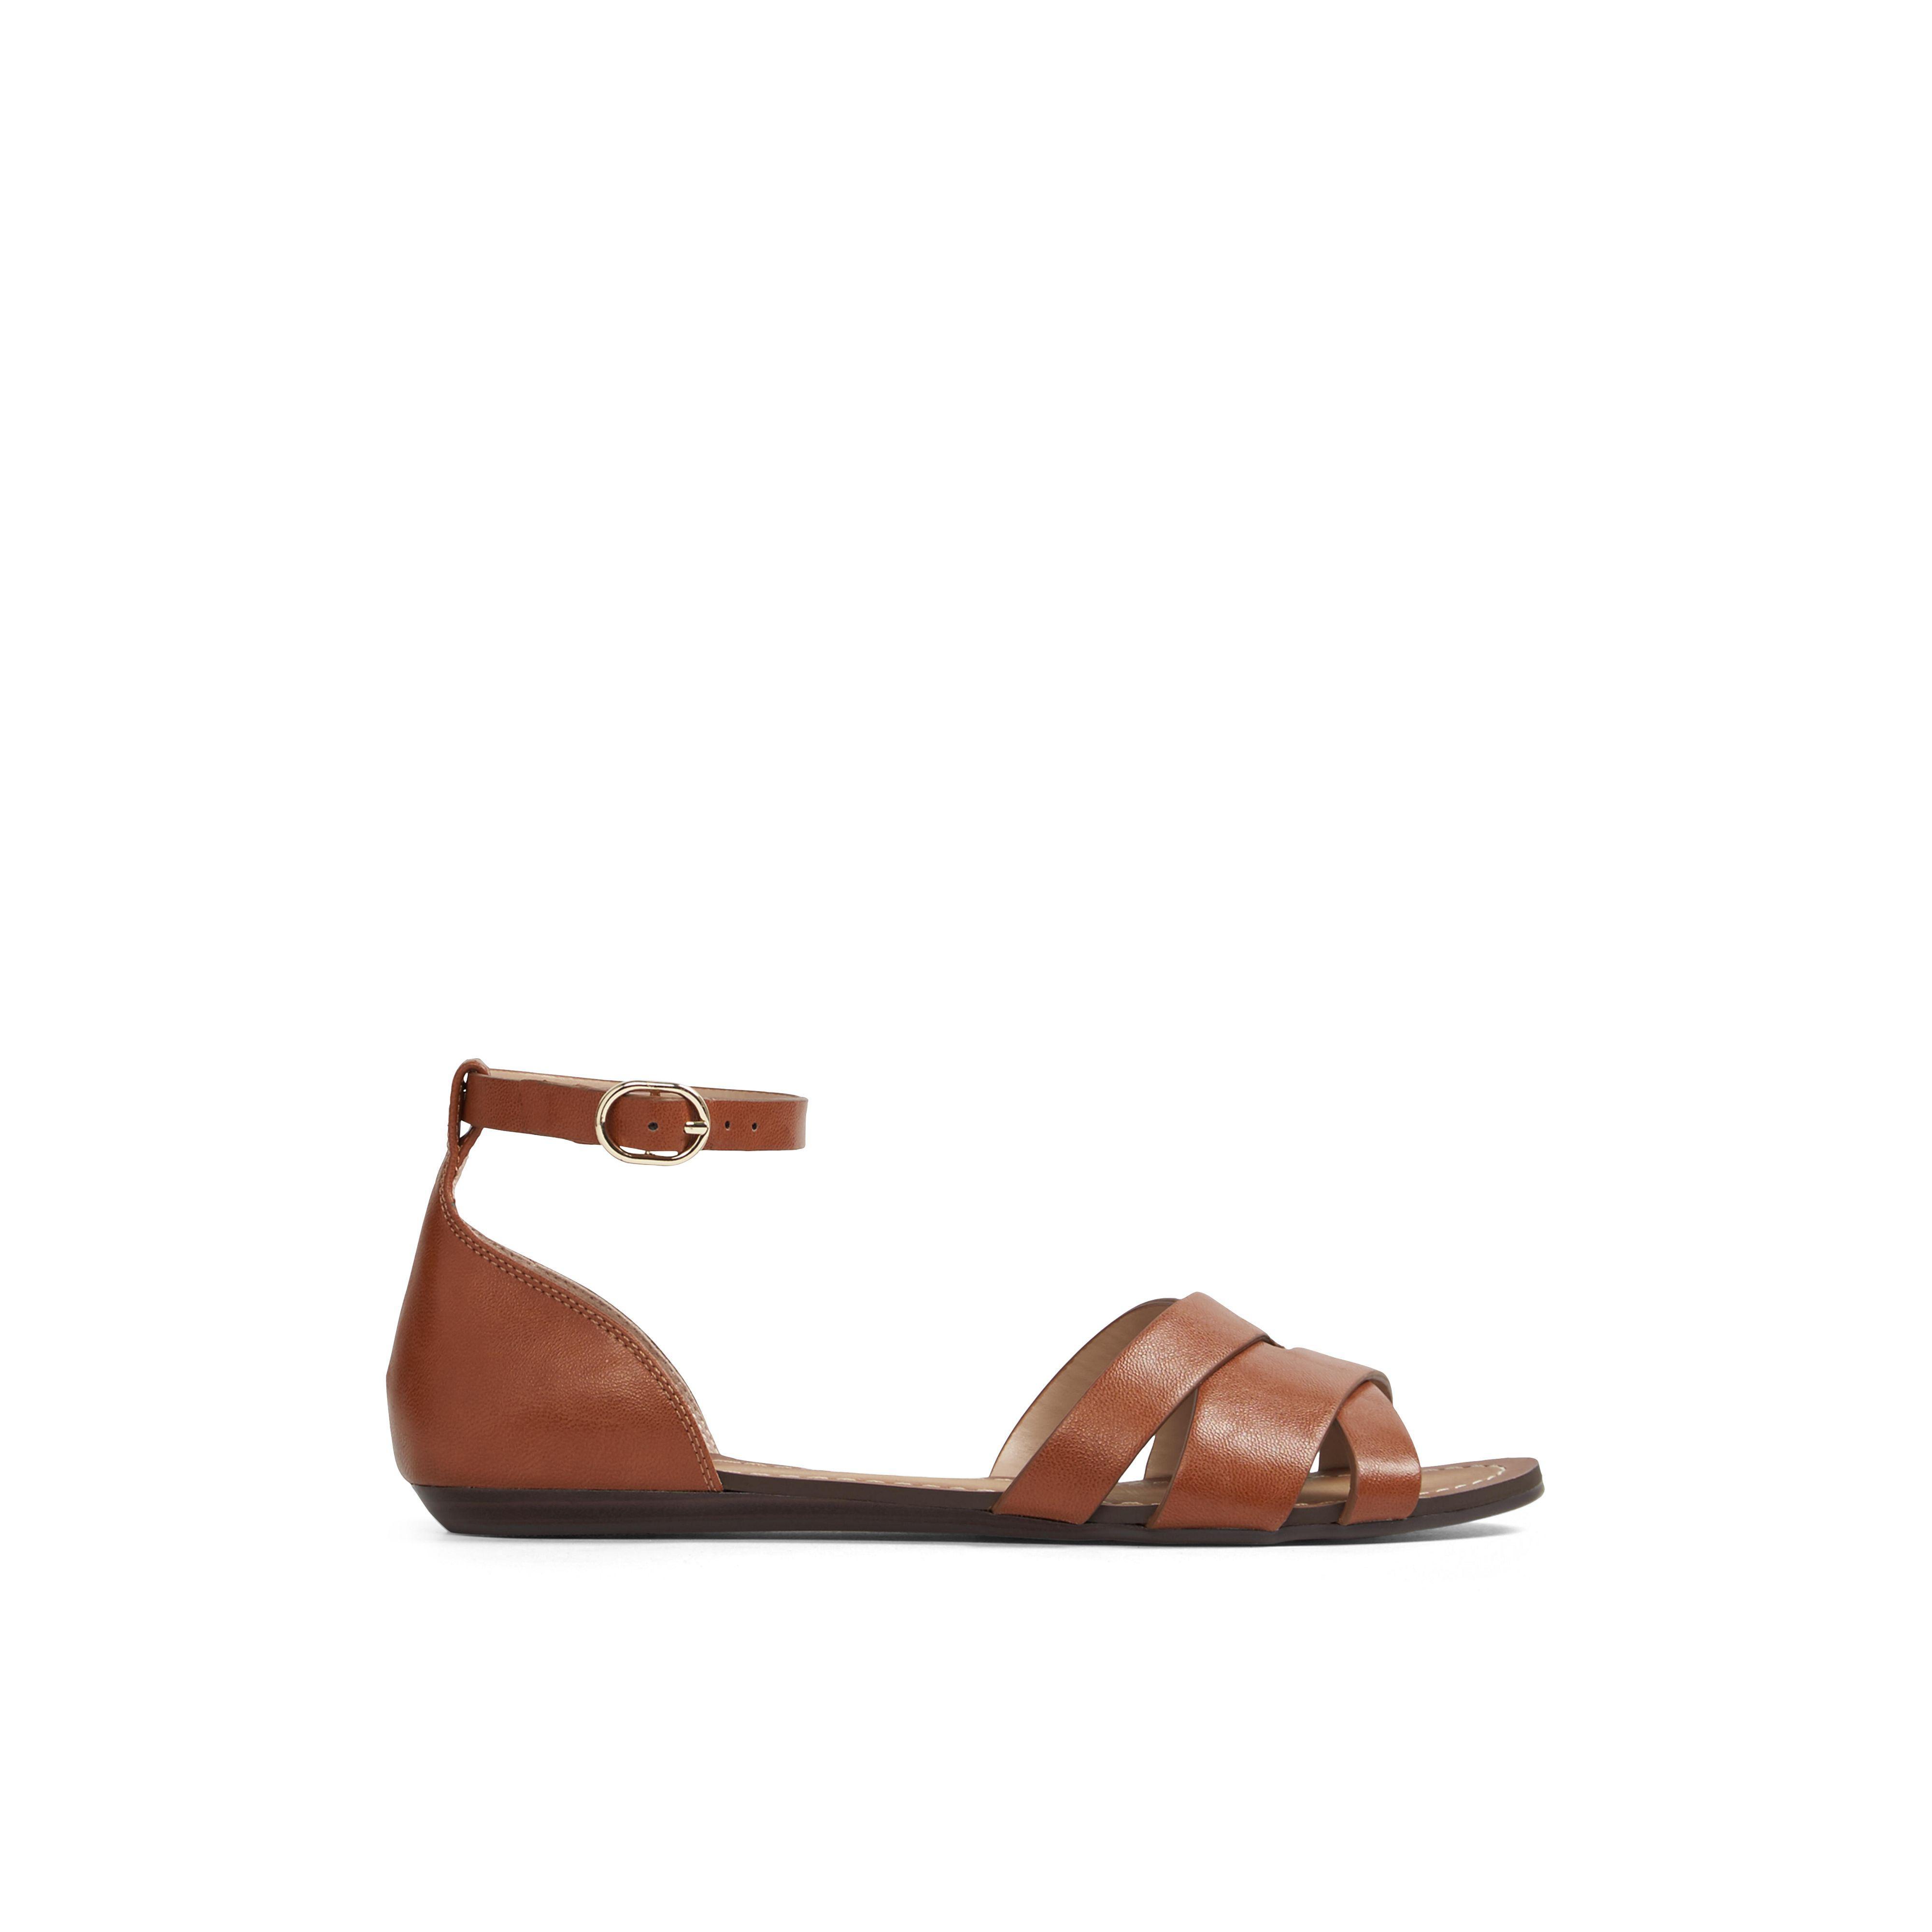 2a574a1fbcf99 Aldo Rozie Flat Sandal in Brown - Lyst